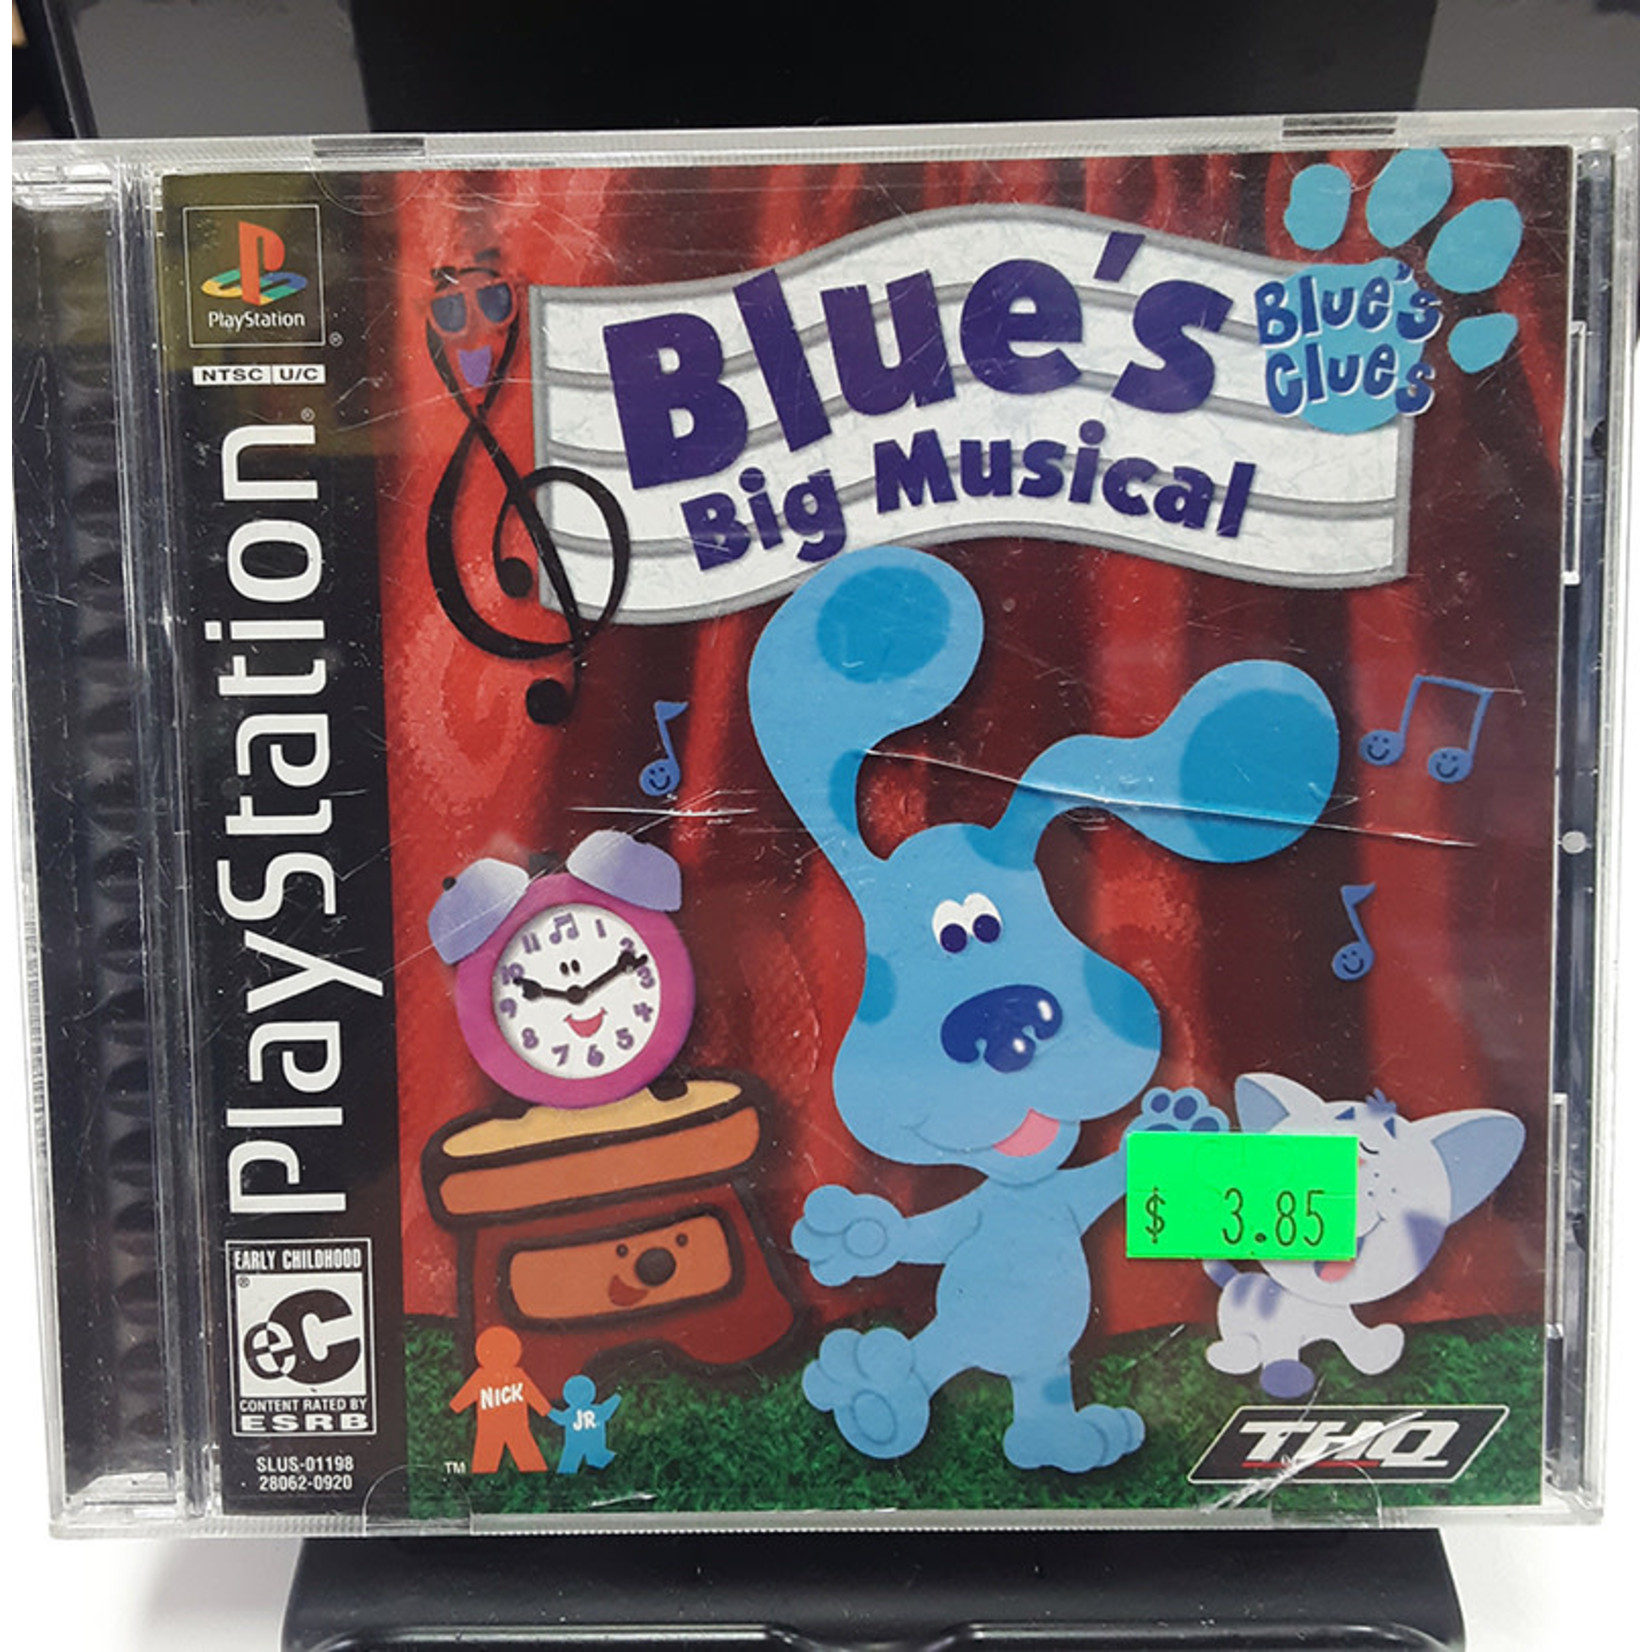 ps1u-Blue's Big Musical